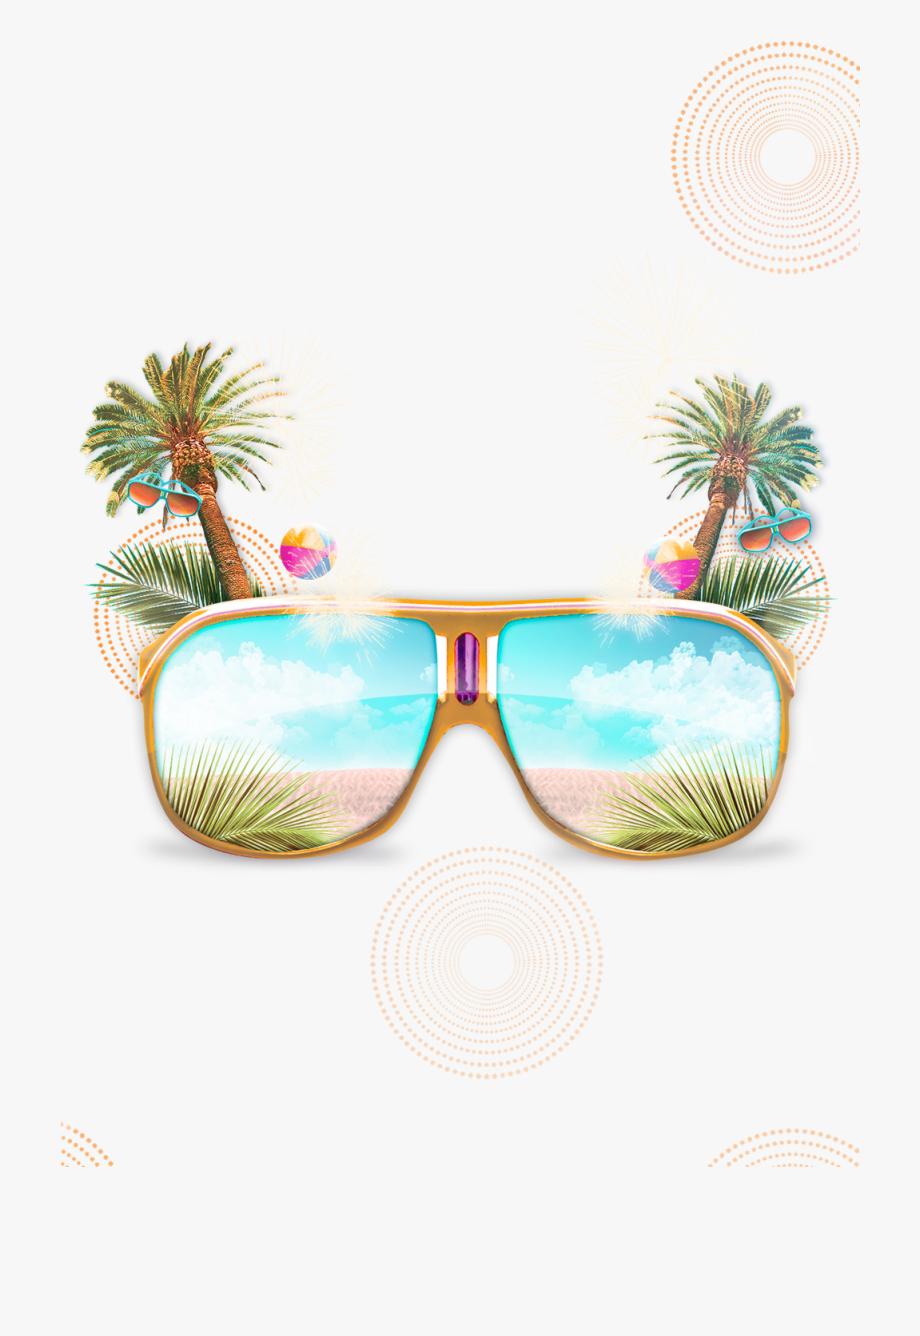 Euclidean Vector Sunglasses File Computer Free Clipart.